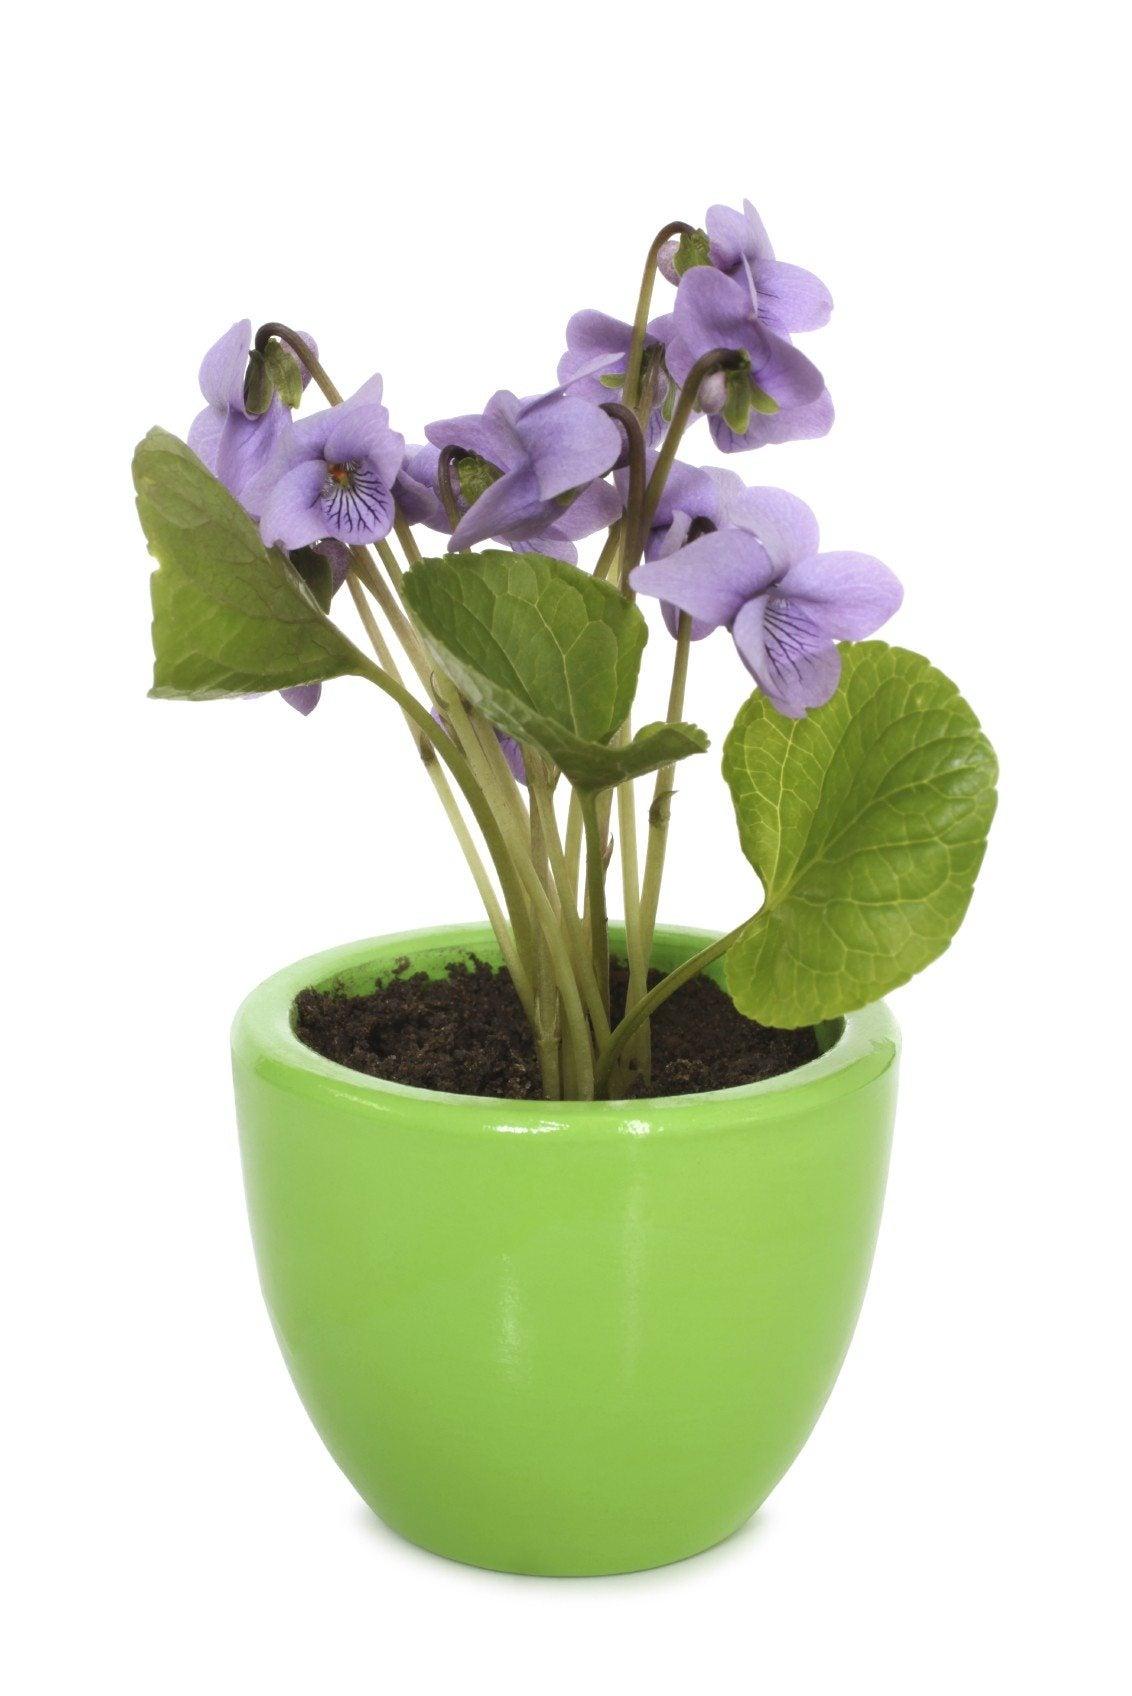 caring for violets indoors